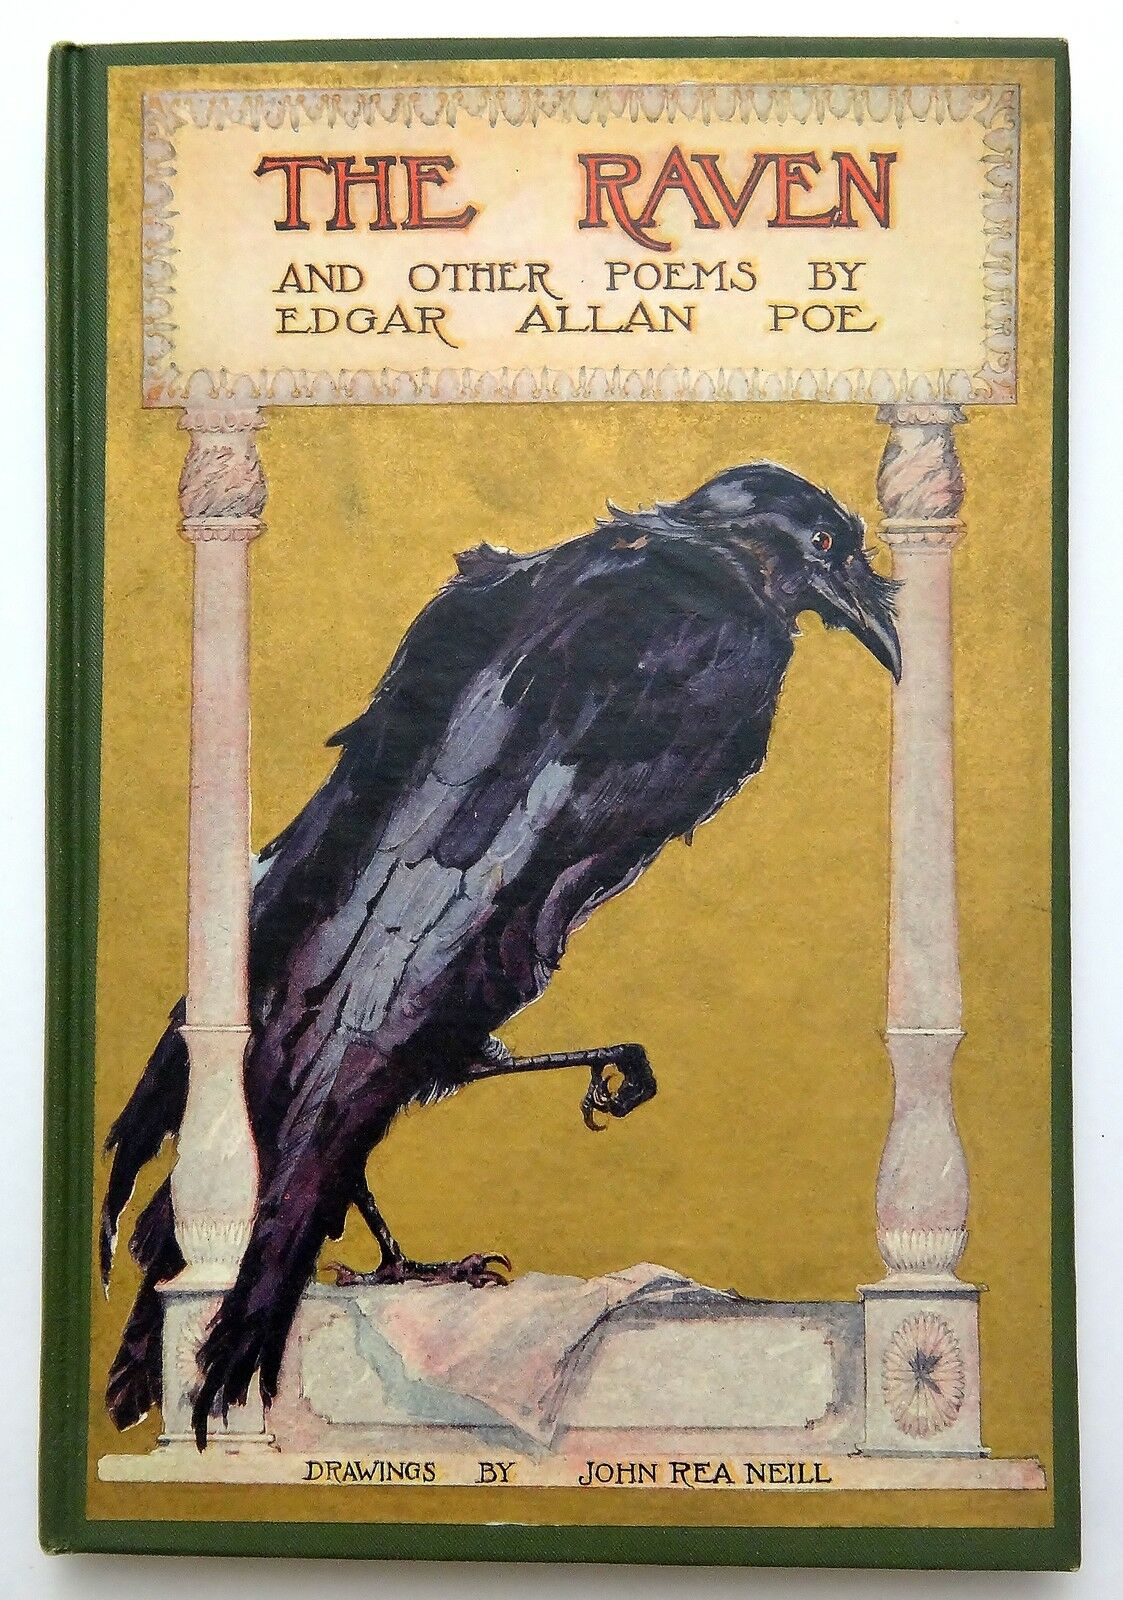 Edgar Allan Poe The Raven Poem Original Art Print